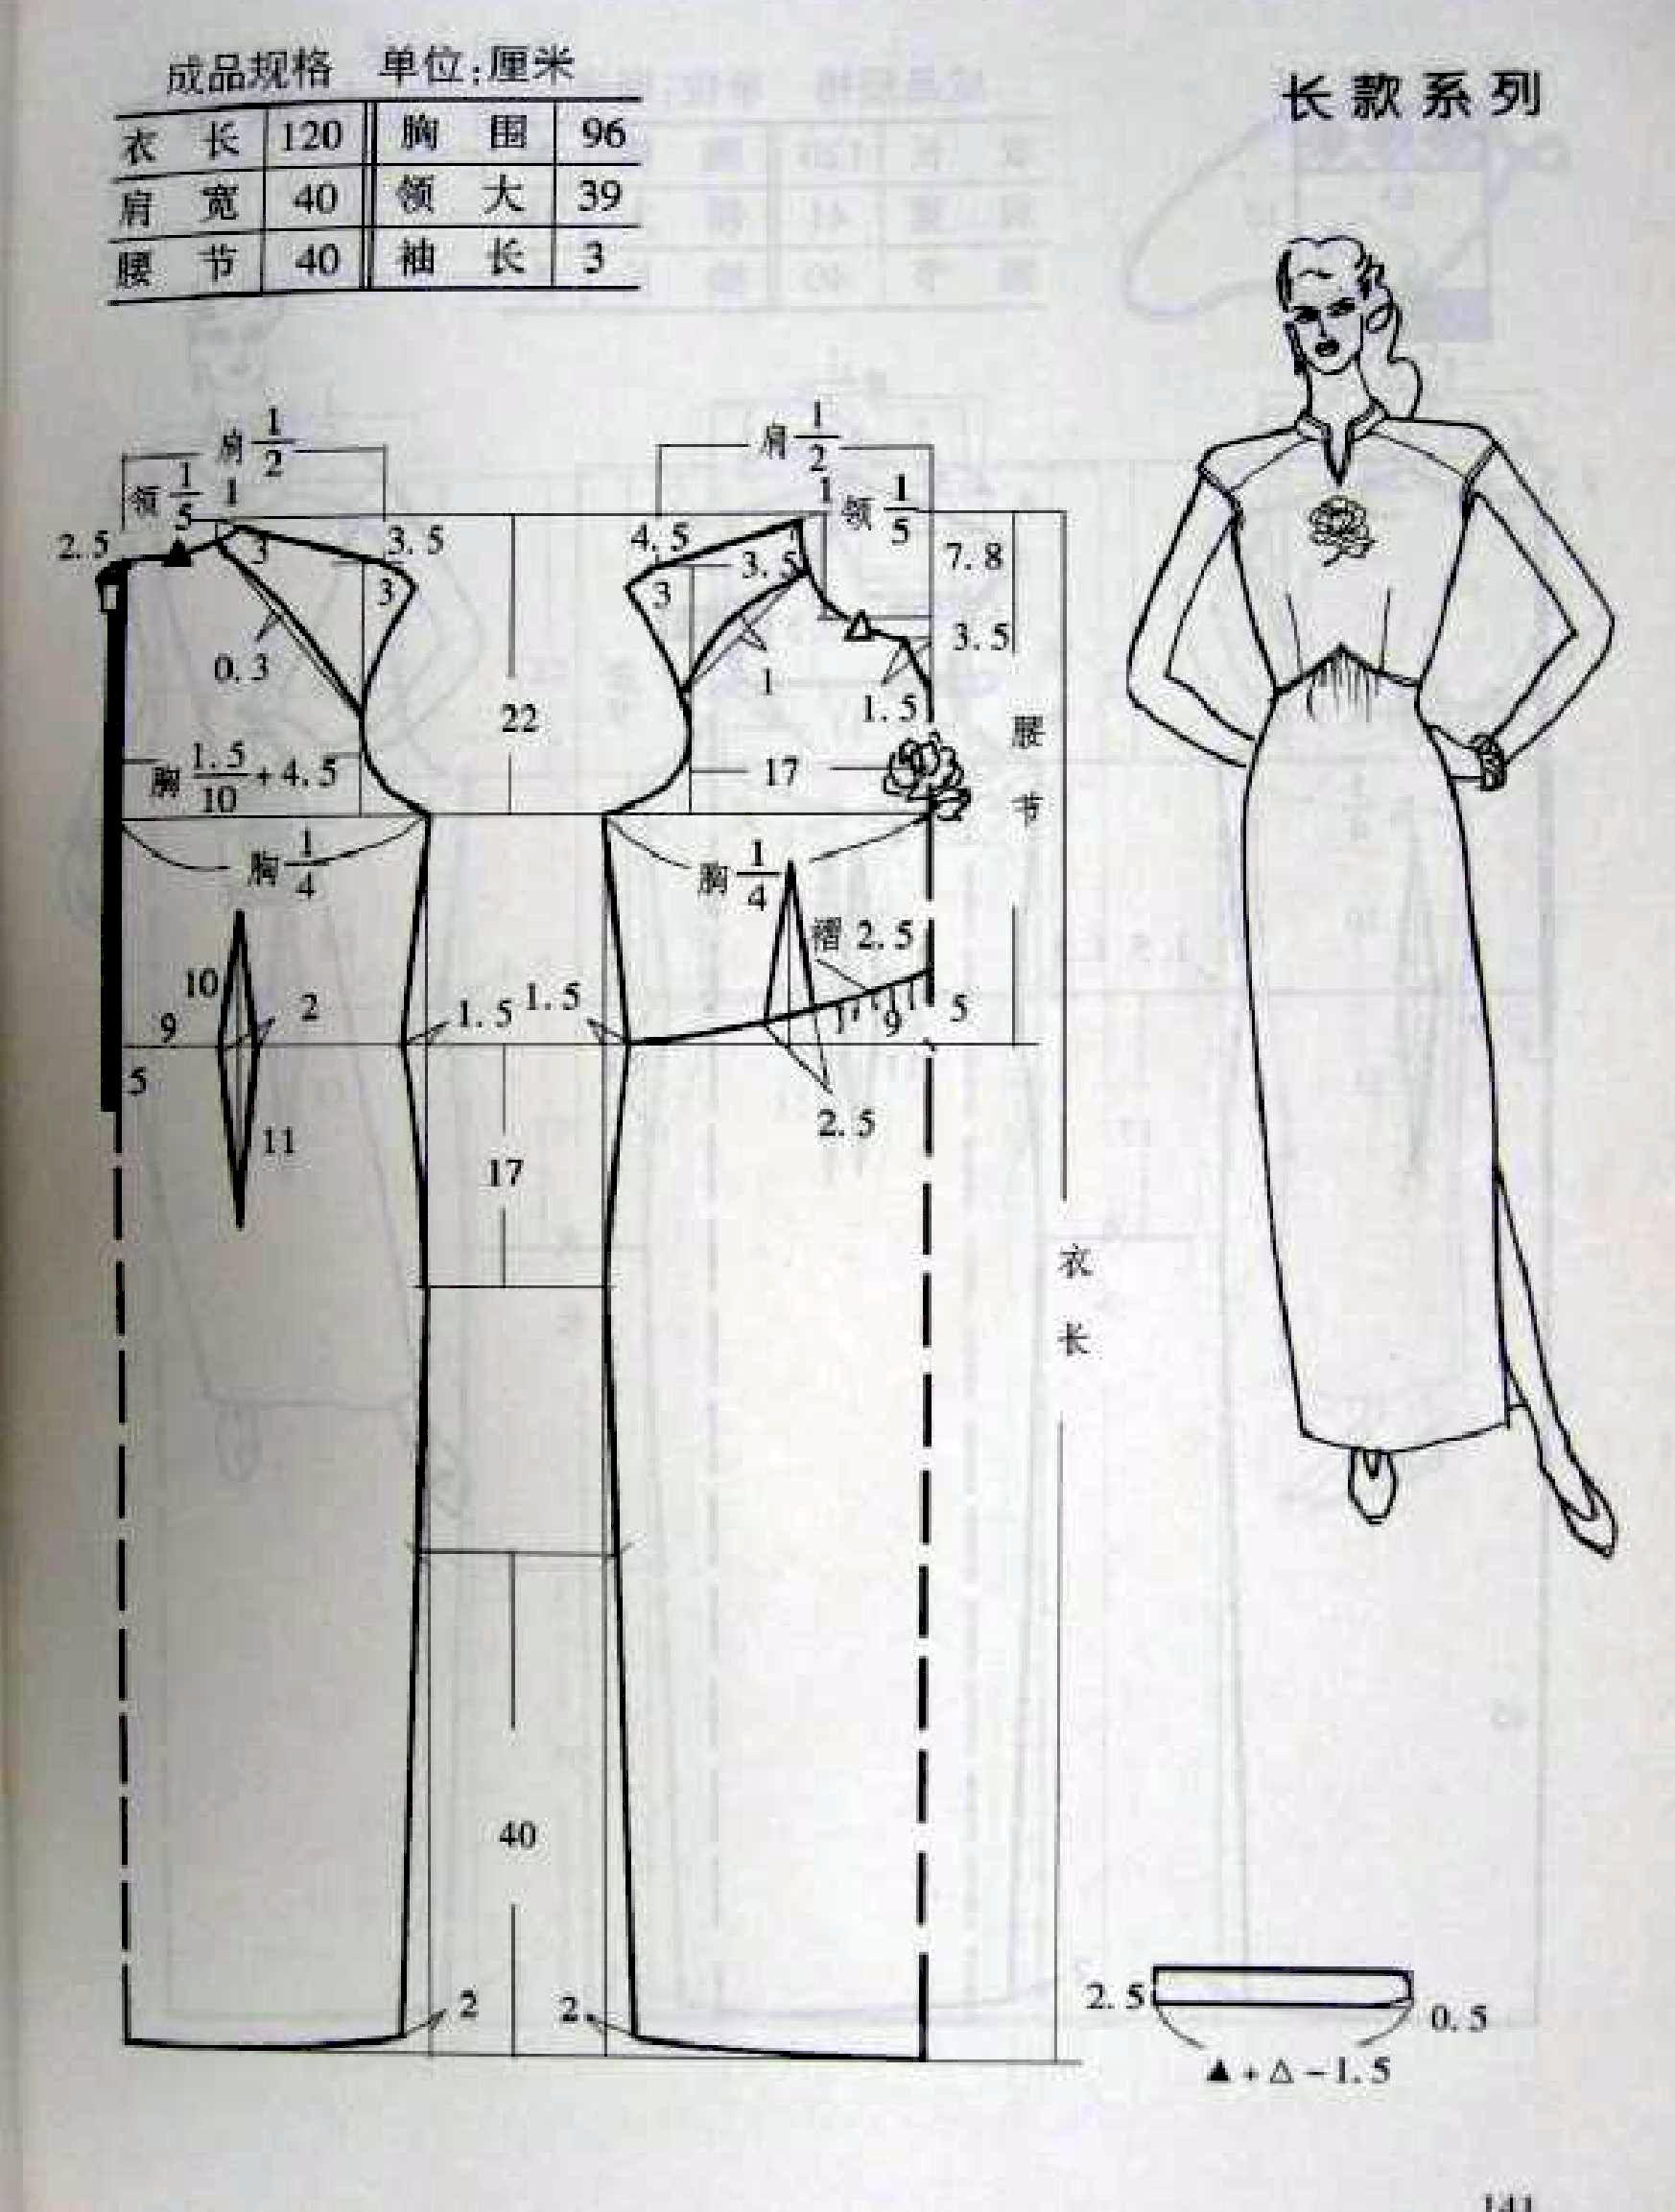 Cheongsam dress design and tailoring patrones pinterest cheongsam dress design and tailoring jeuxipadfo Choice Image